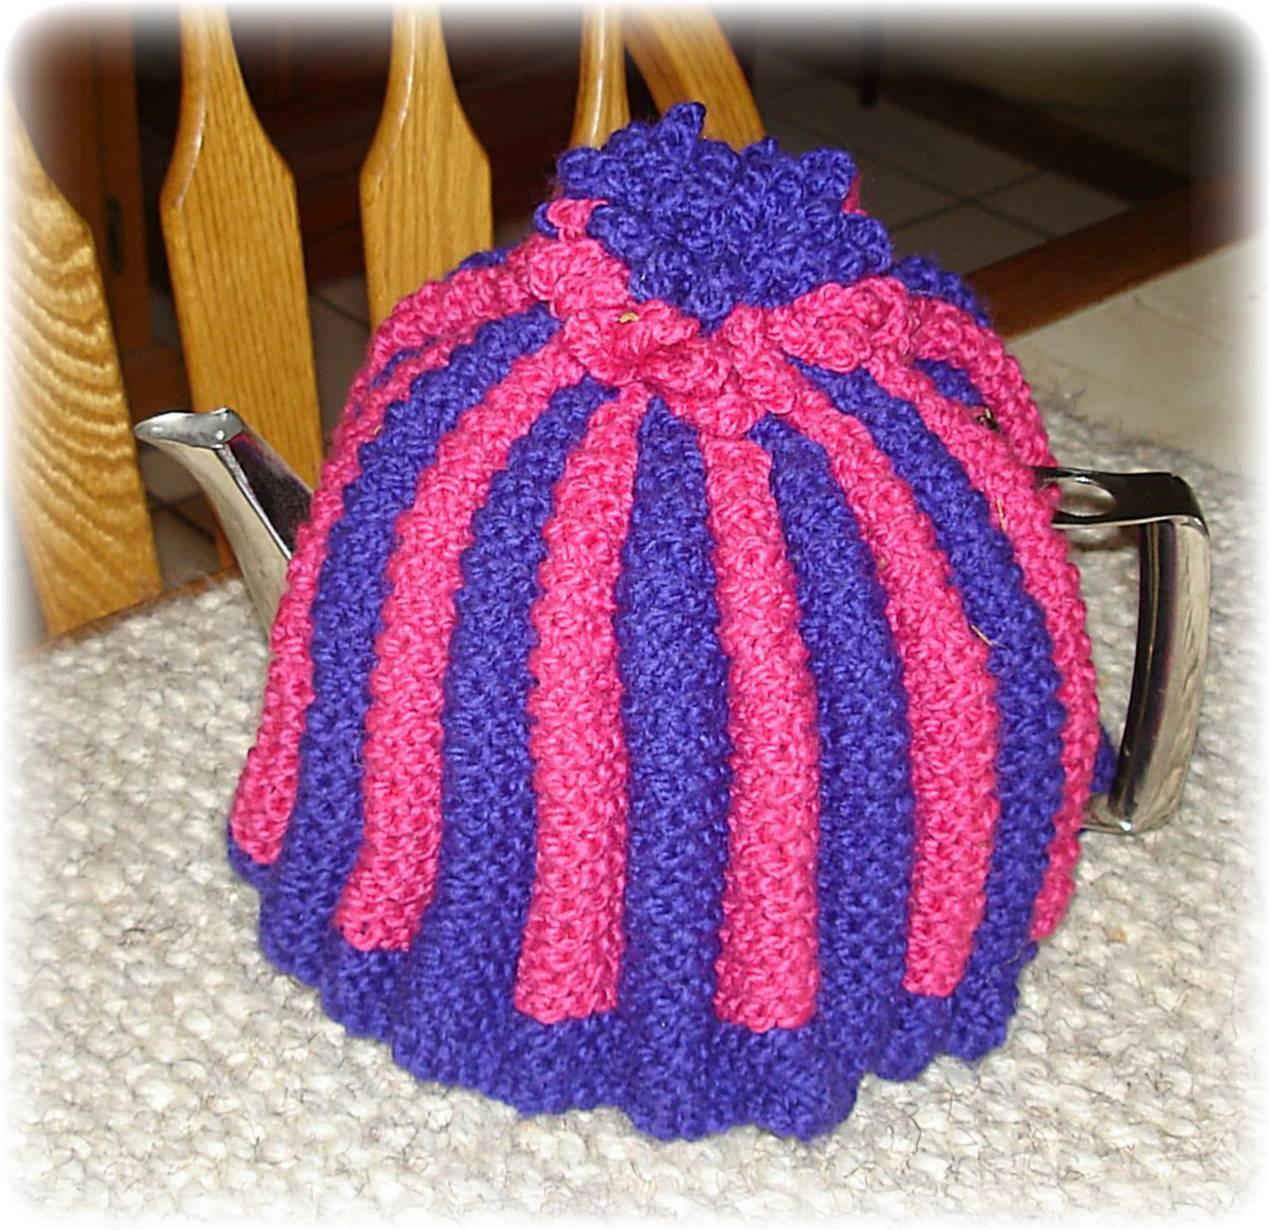 Knitting Pattern for Bobbly Tea Cosy